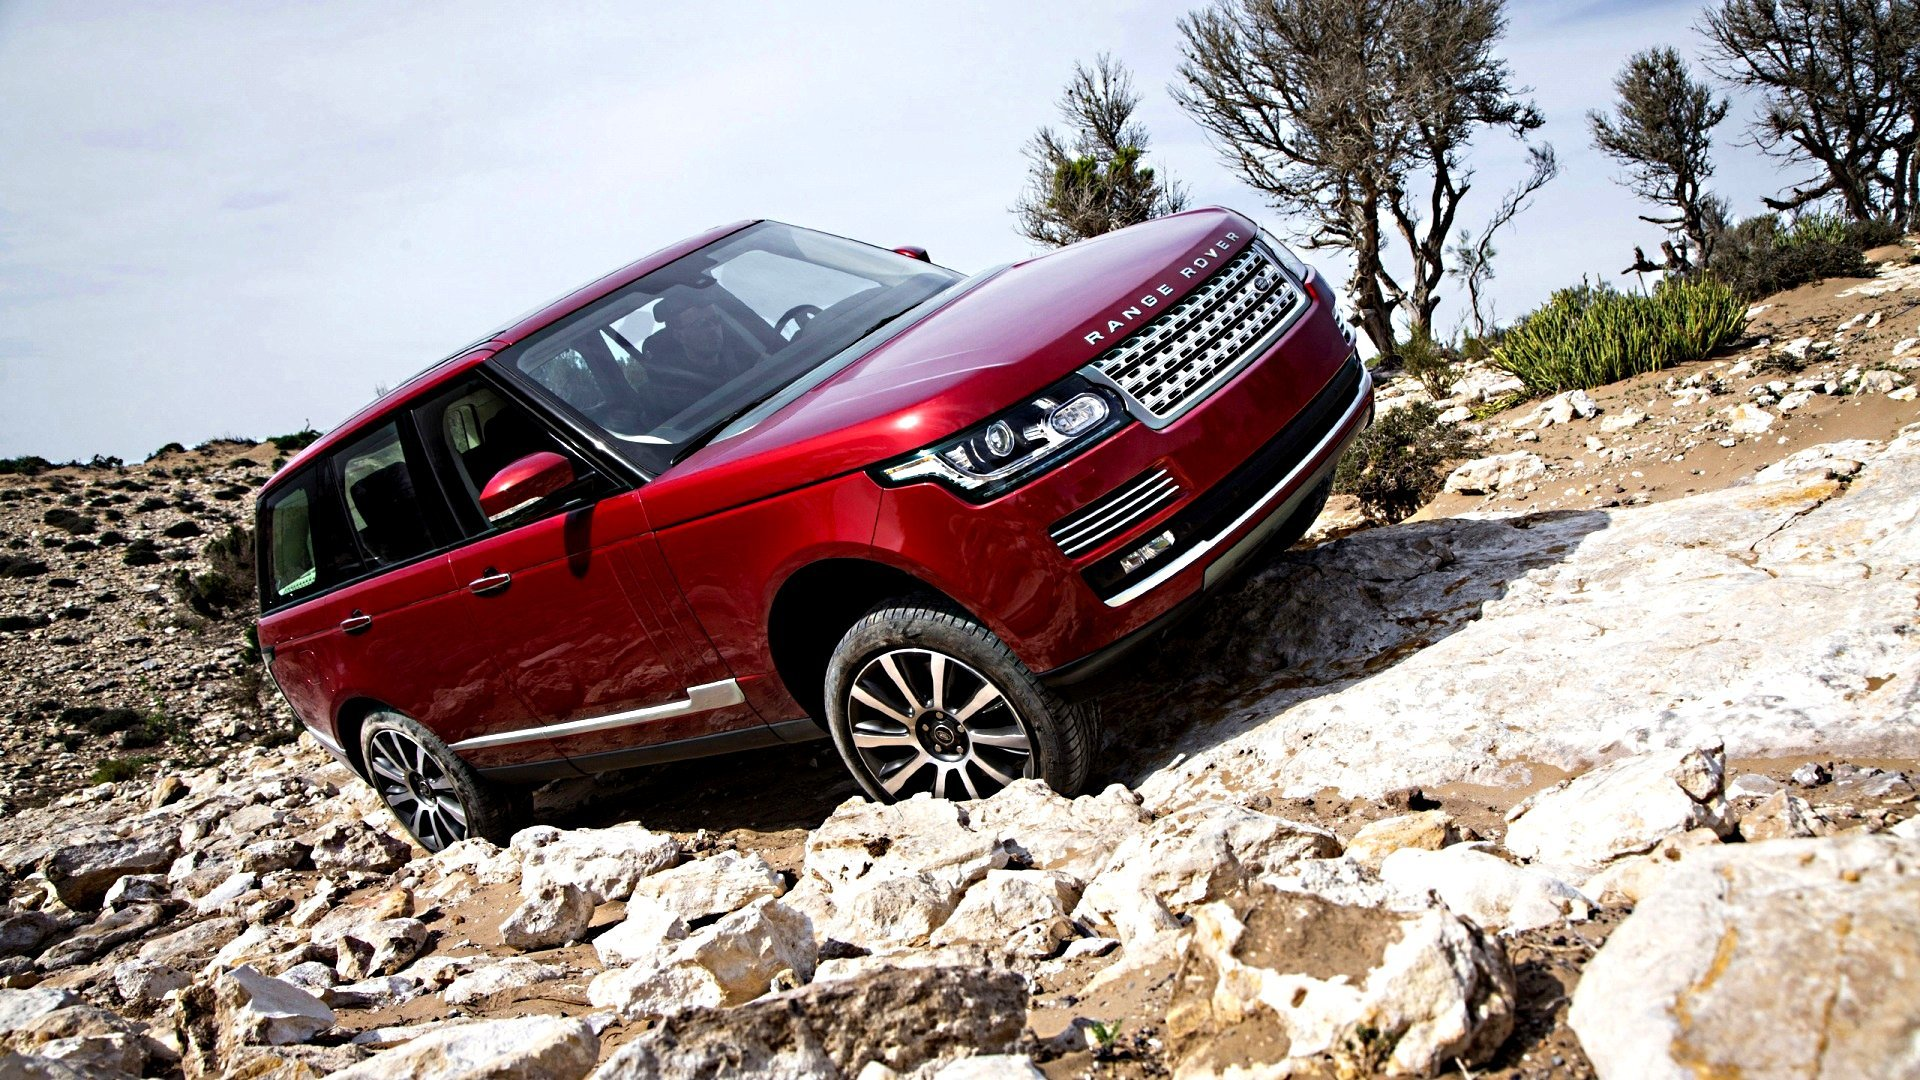 High Resolution Range Rover Hd 1080p Wallpaper Id 162883 For Desktop